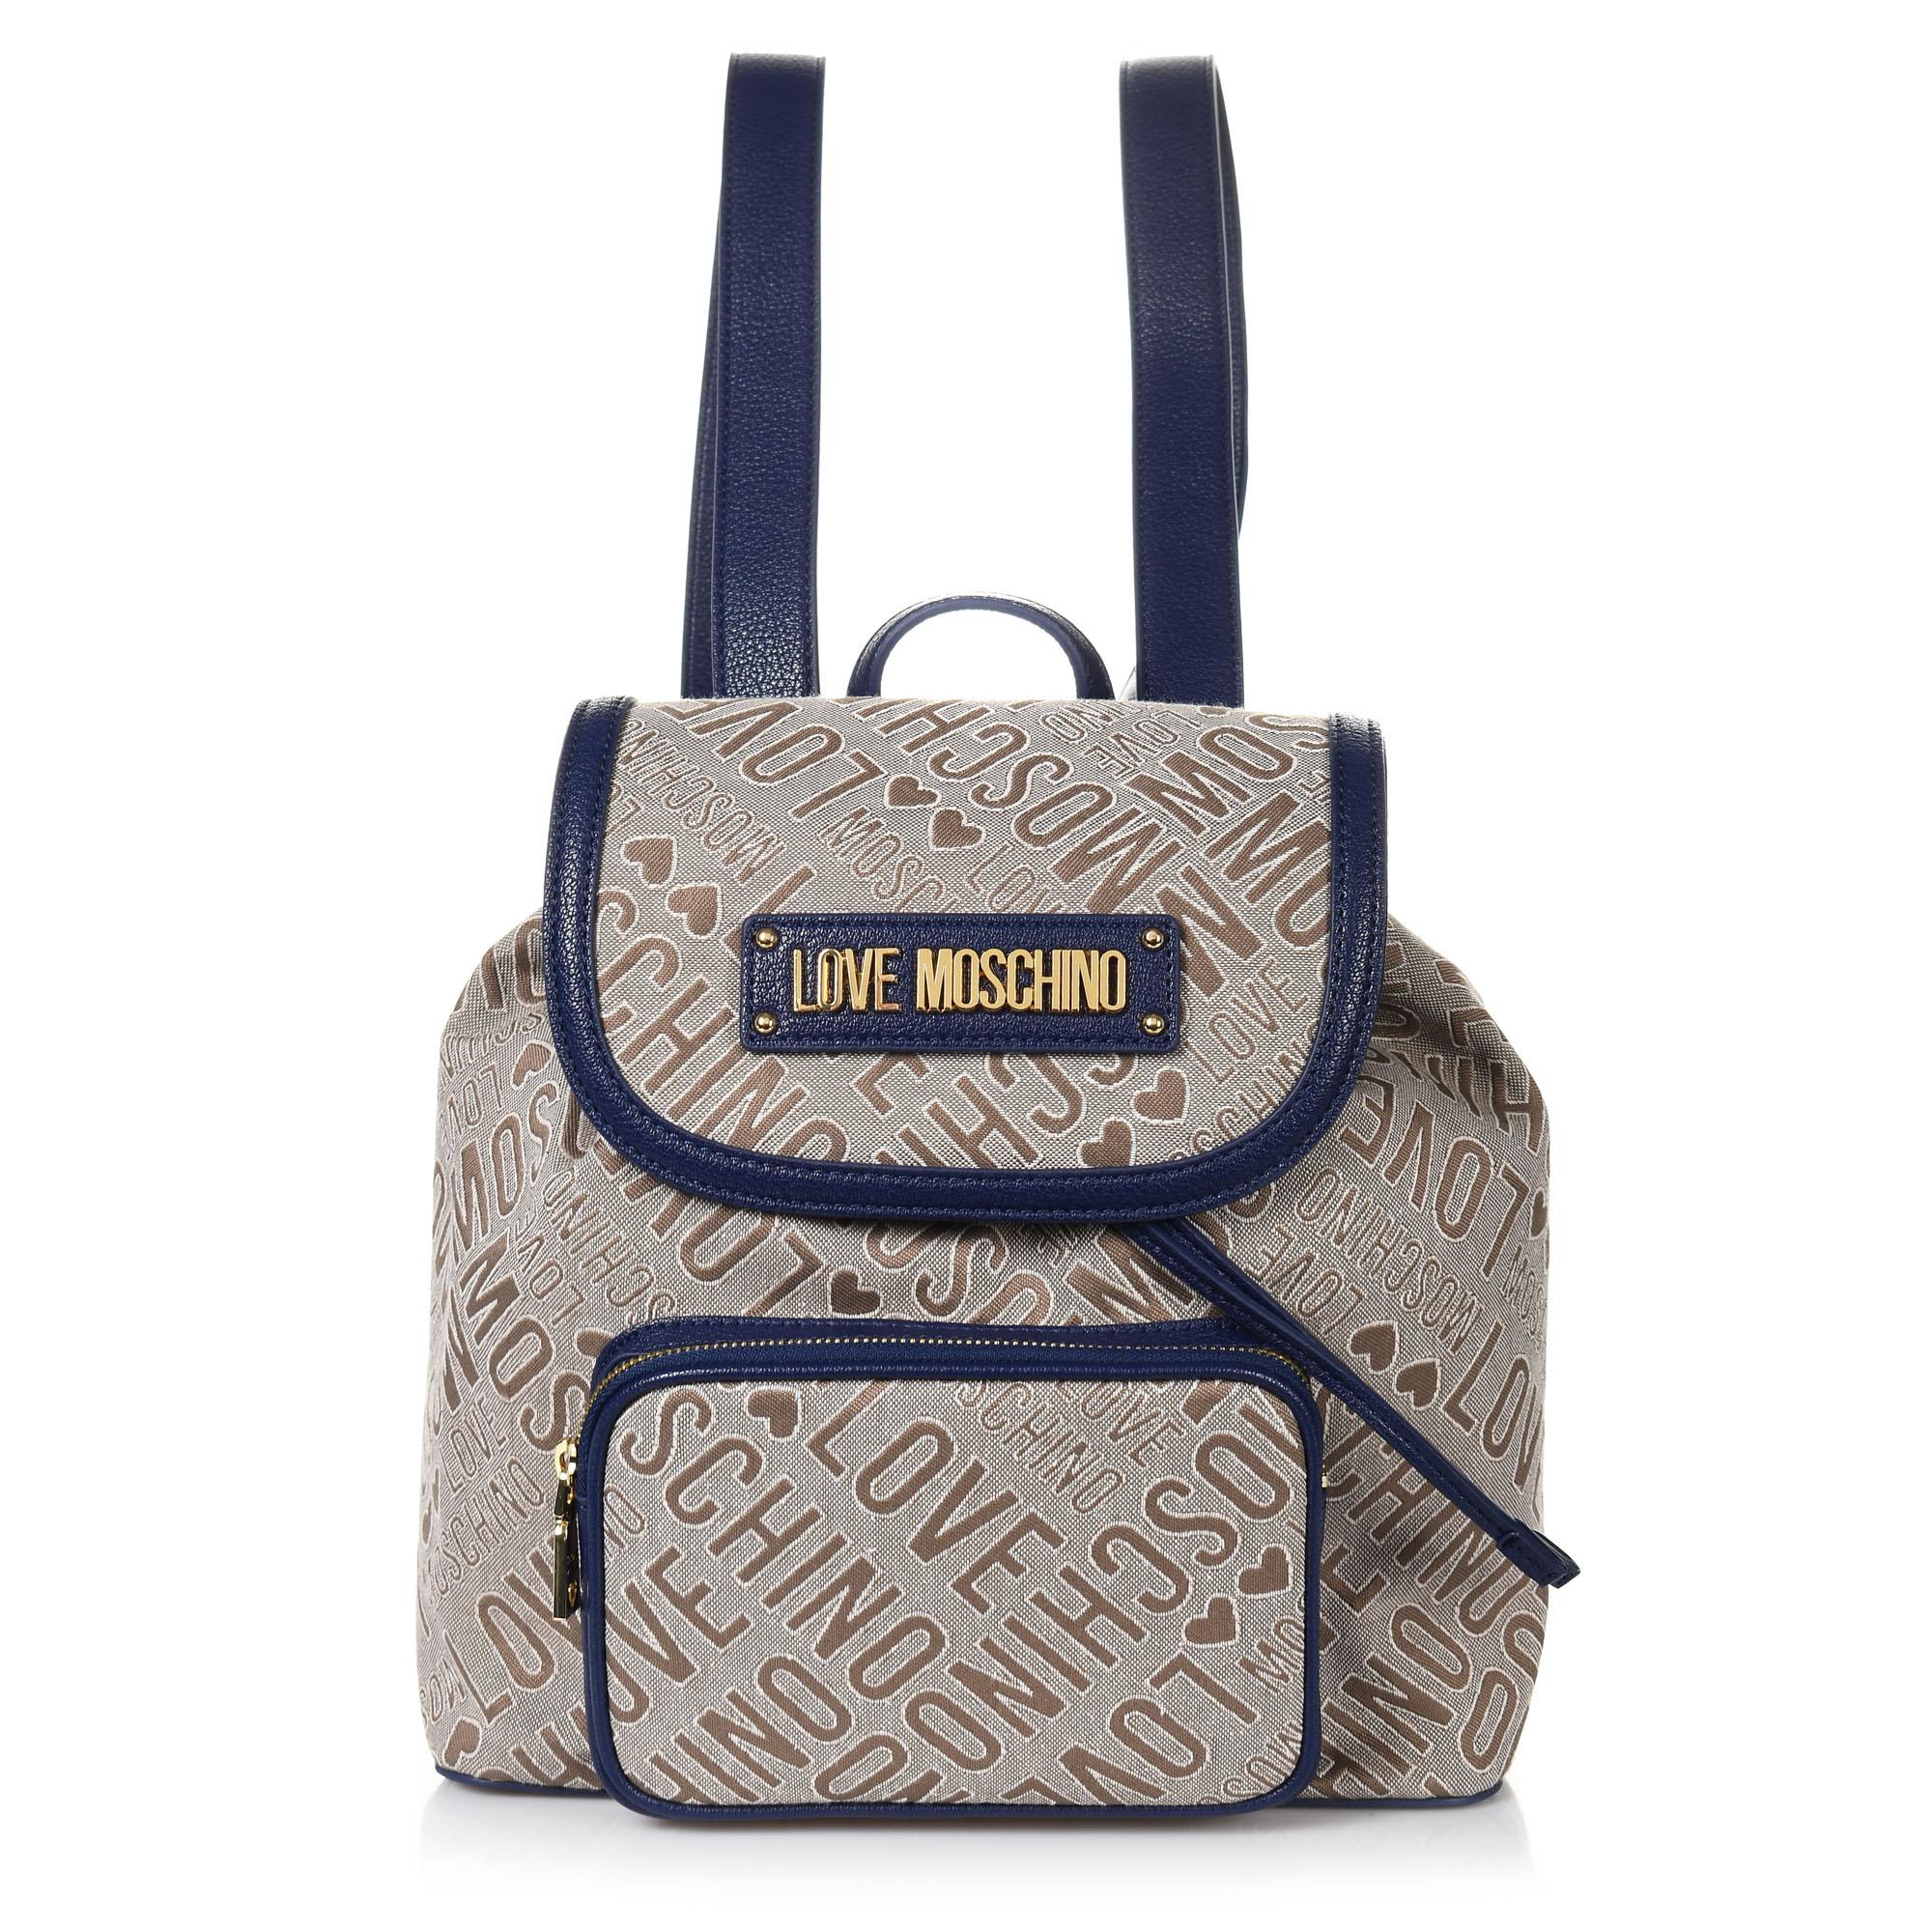 Brand Bags Σακίδιο Πλάτης Love Moschino Borsa Tess JC4020PP17LC 93d45834f45